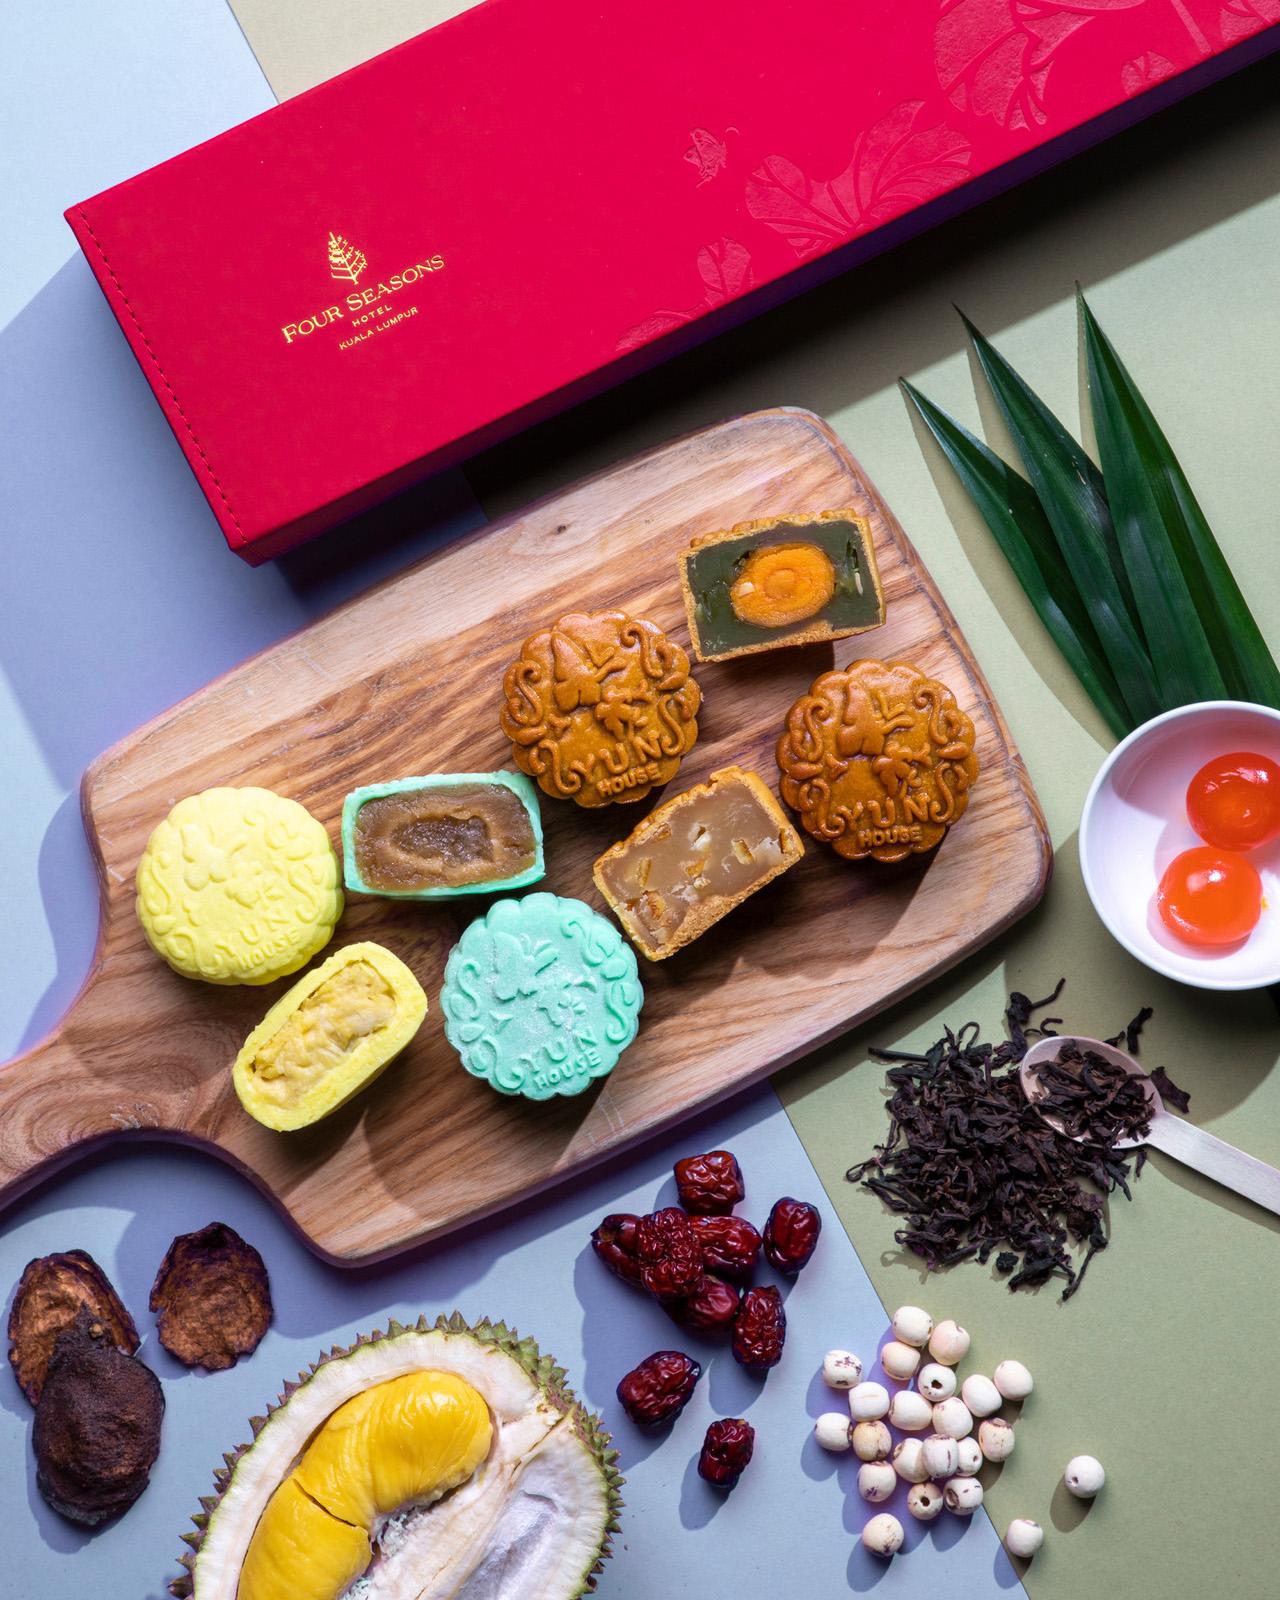 Four Seasons Hotel KL mooncake 2021 - 12款最适合商务送礼的高级月饼礼盒